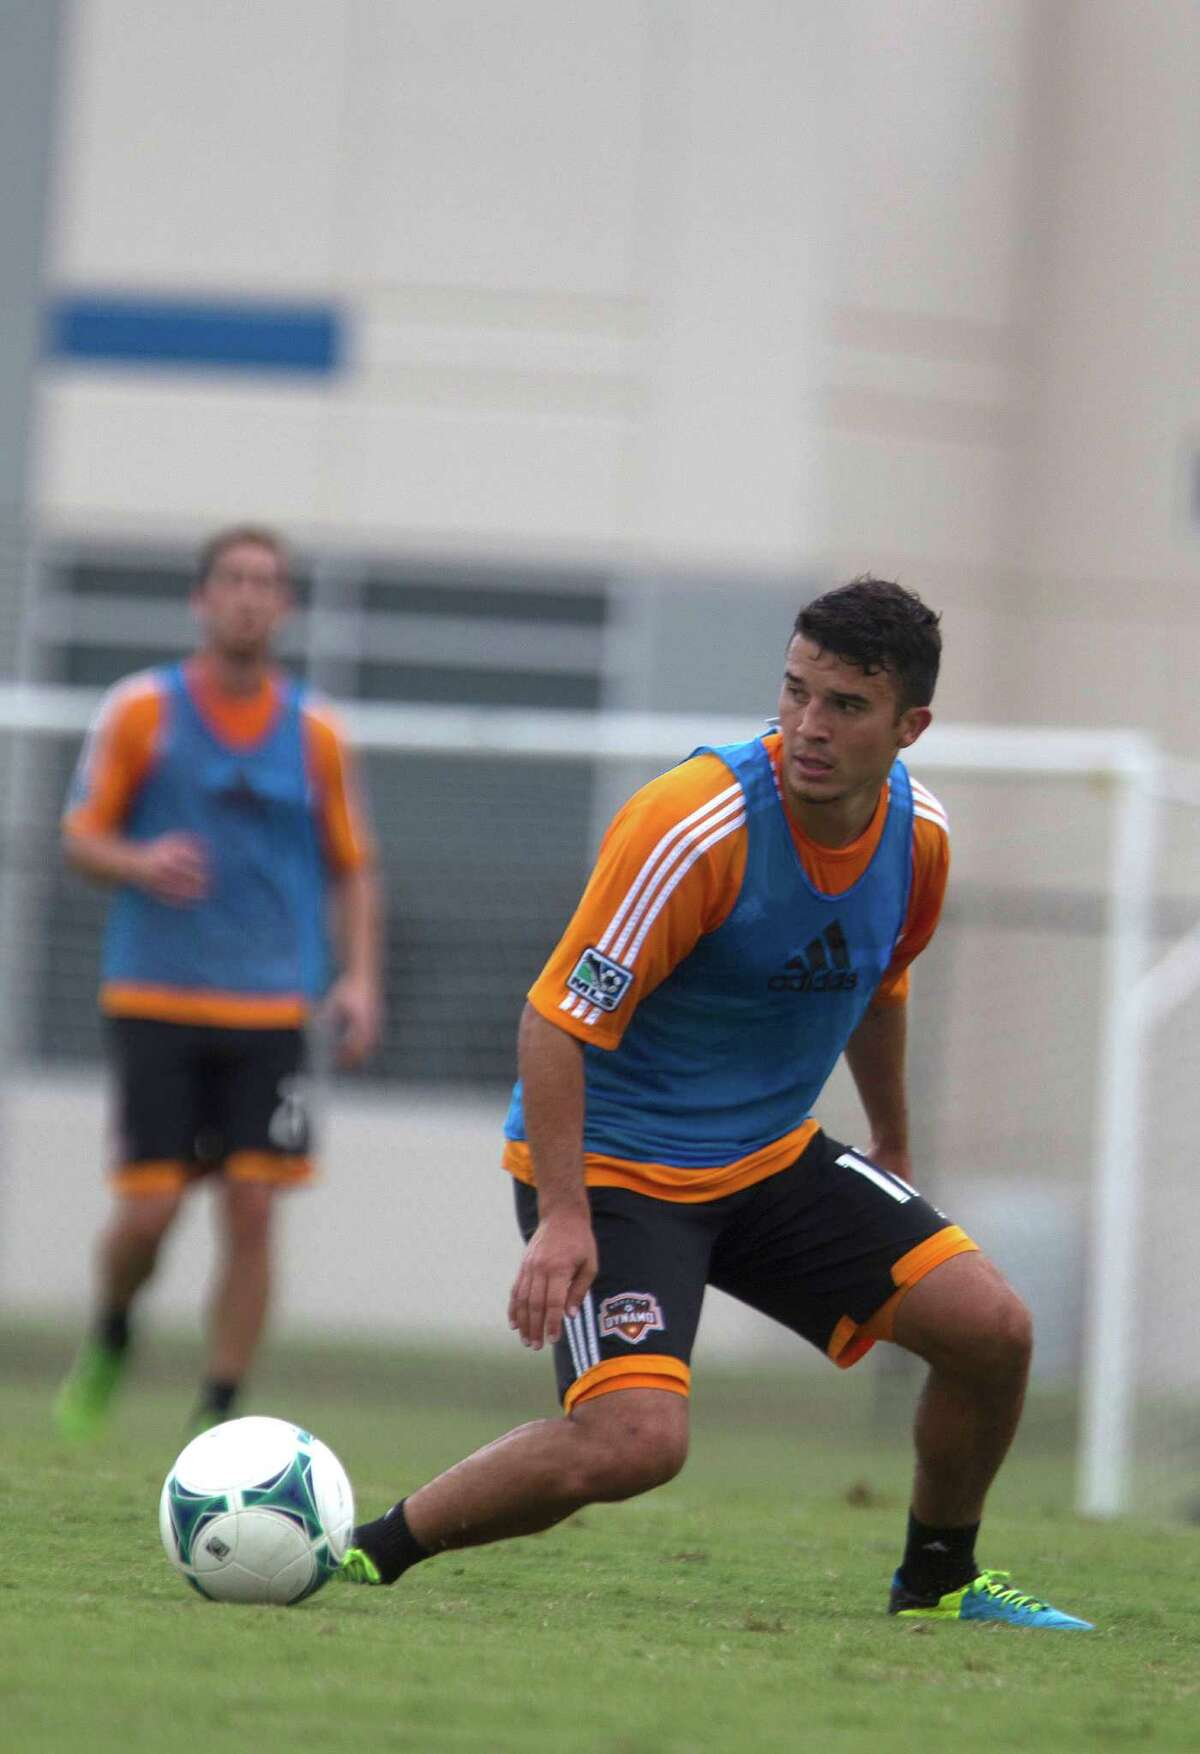 The Dynamo acquired Servando Carrasco from Seattle in a trade for Adam Moffat on Sept. 13.